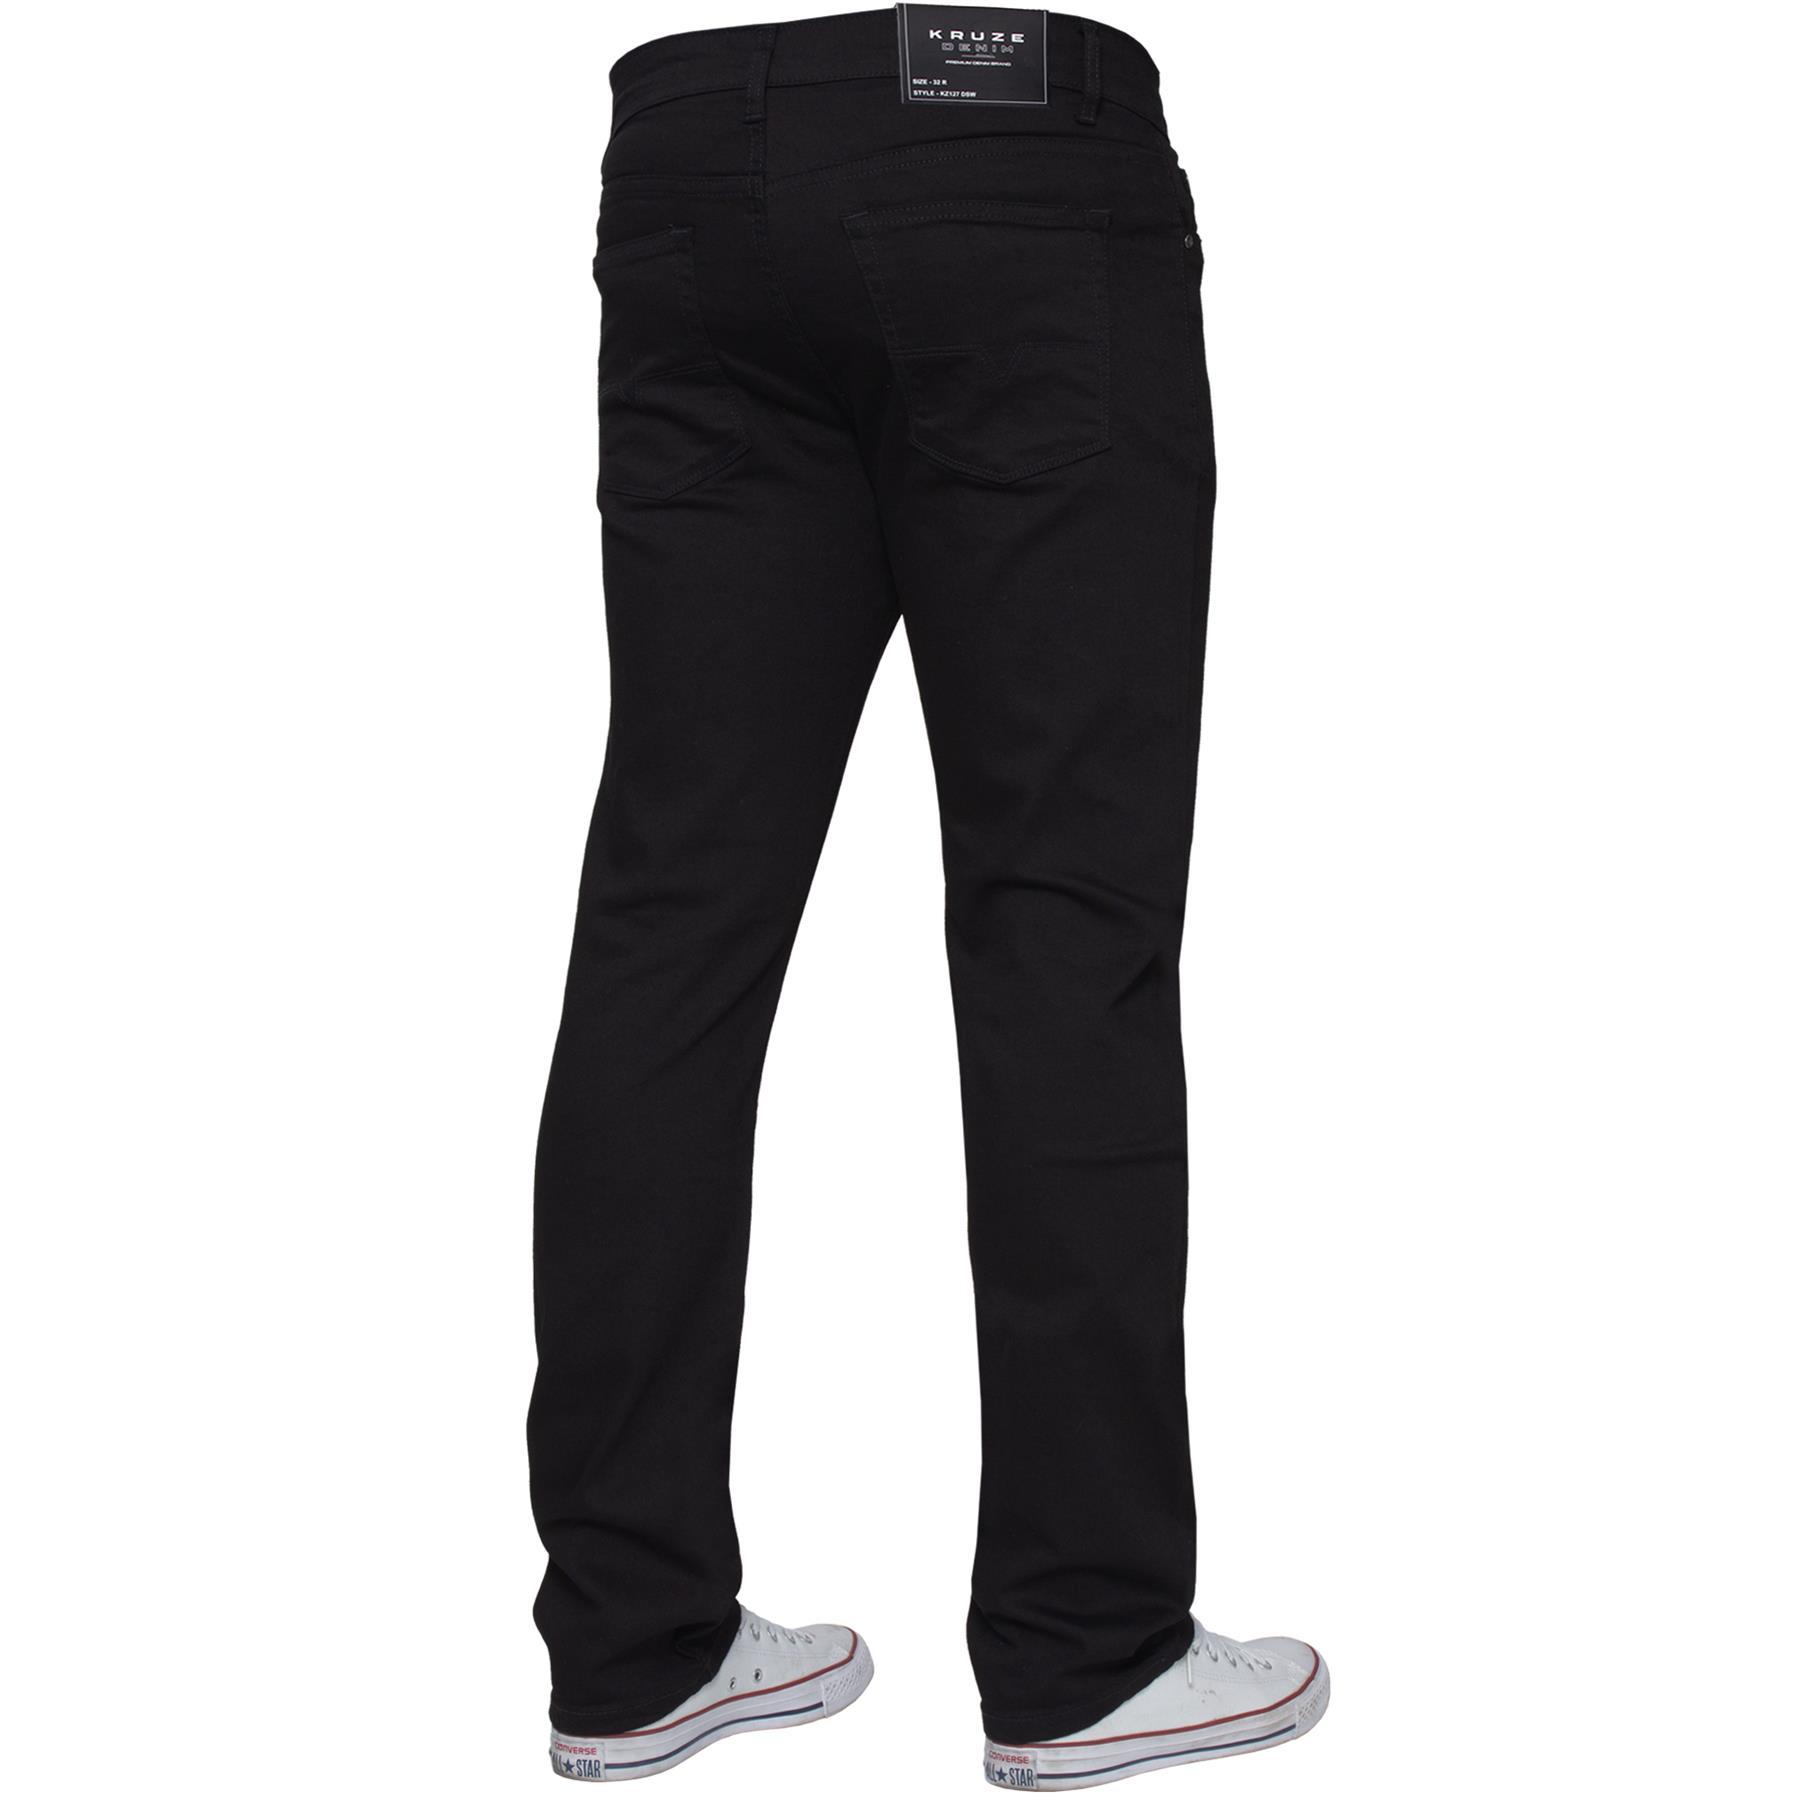 Para-Hombre-Pierna-Recta-Bootcut-Stretch-Denim-Regulares-Pantalon-de-trabajo-Kruze-Todas-Cinturas miniatura 22